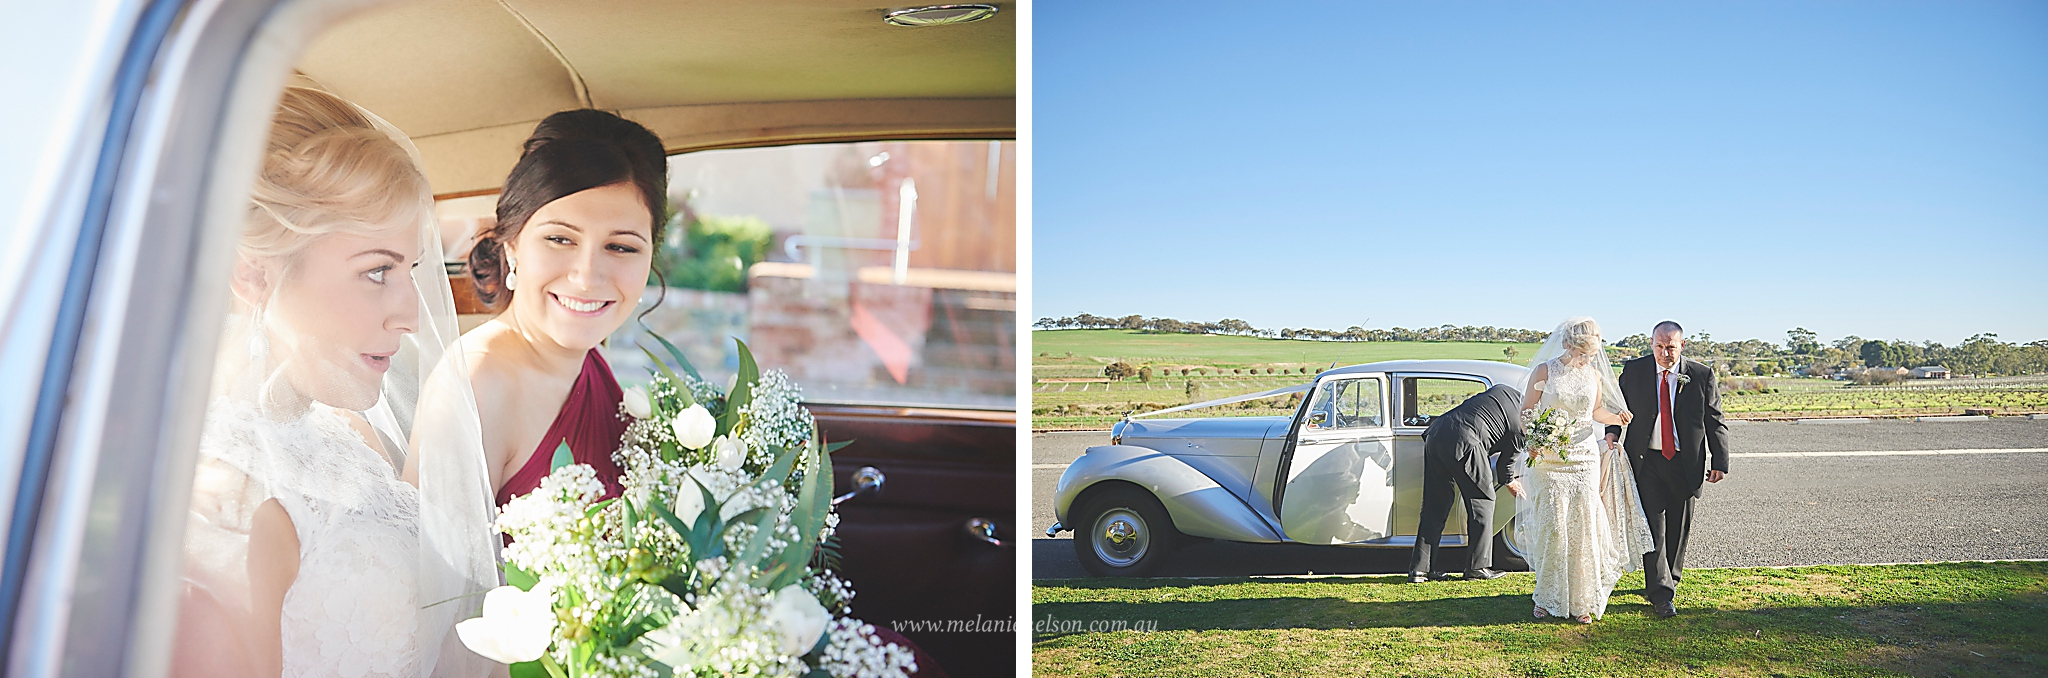 barossa_wedding_photography_0008.jpg